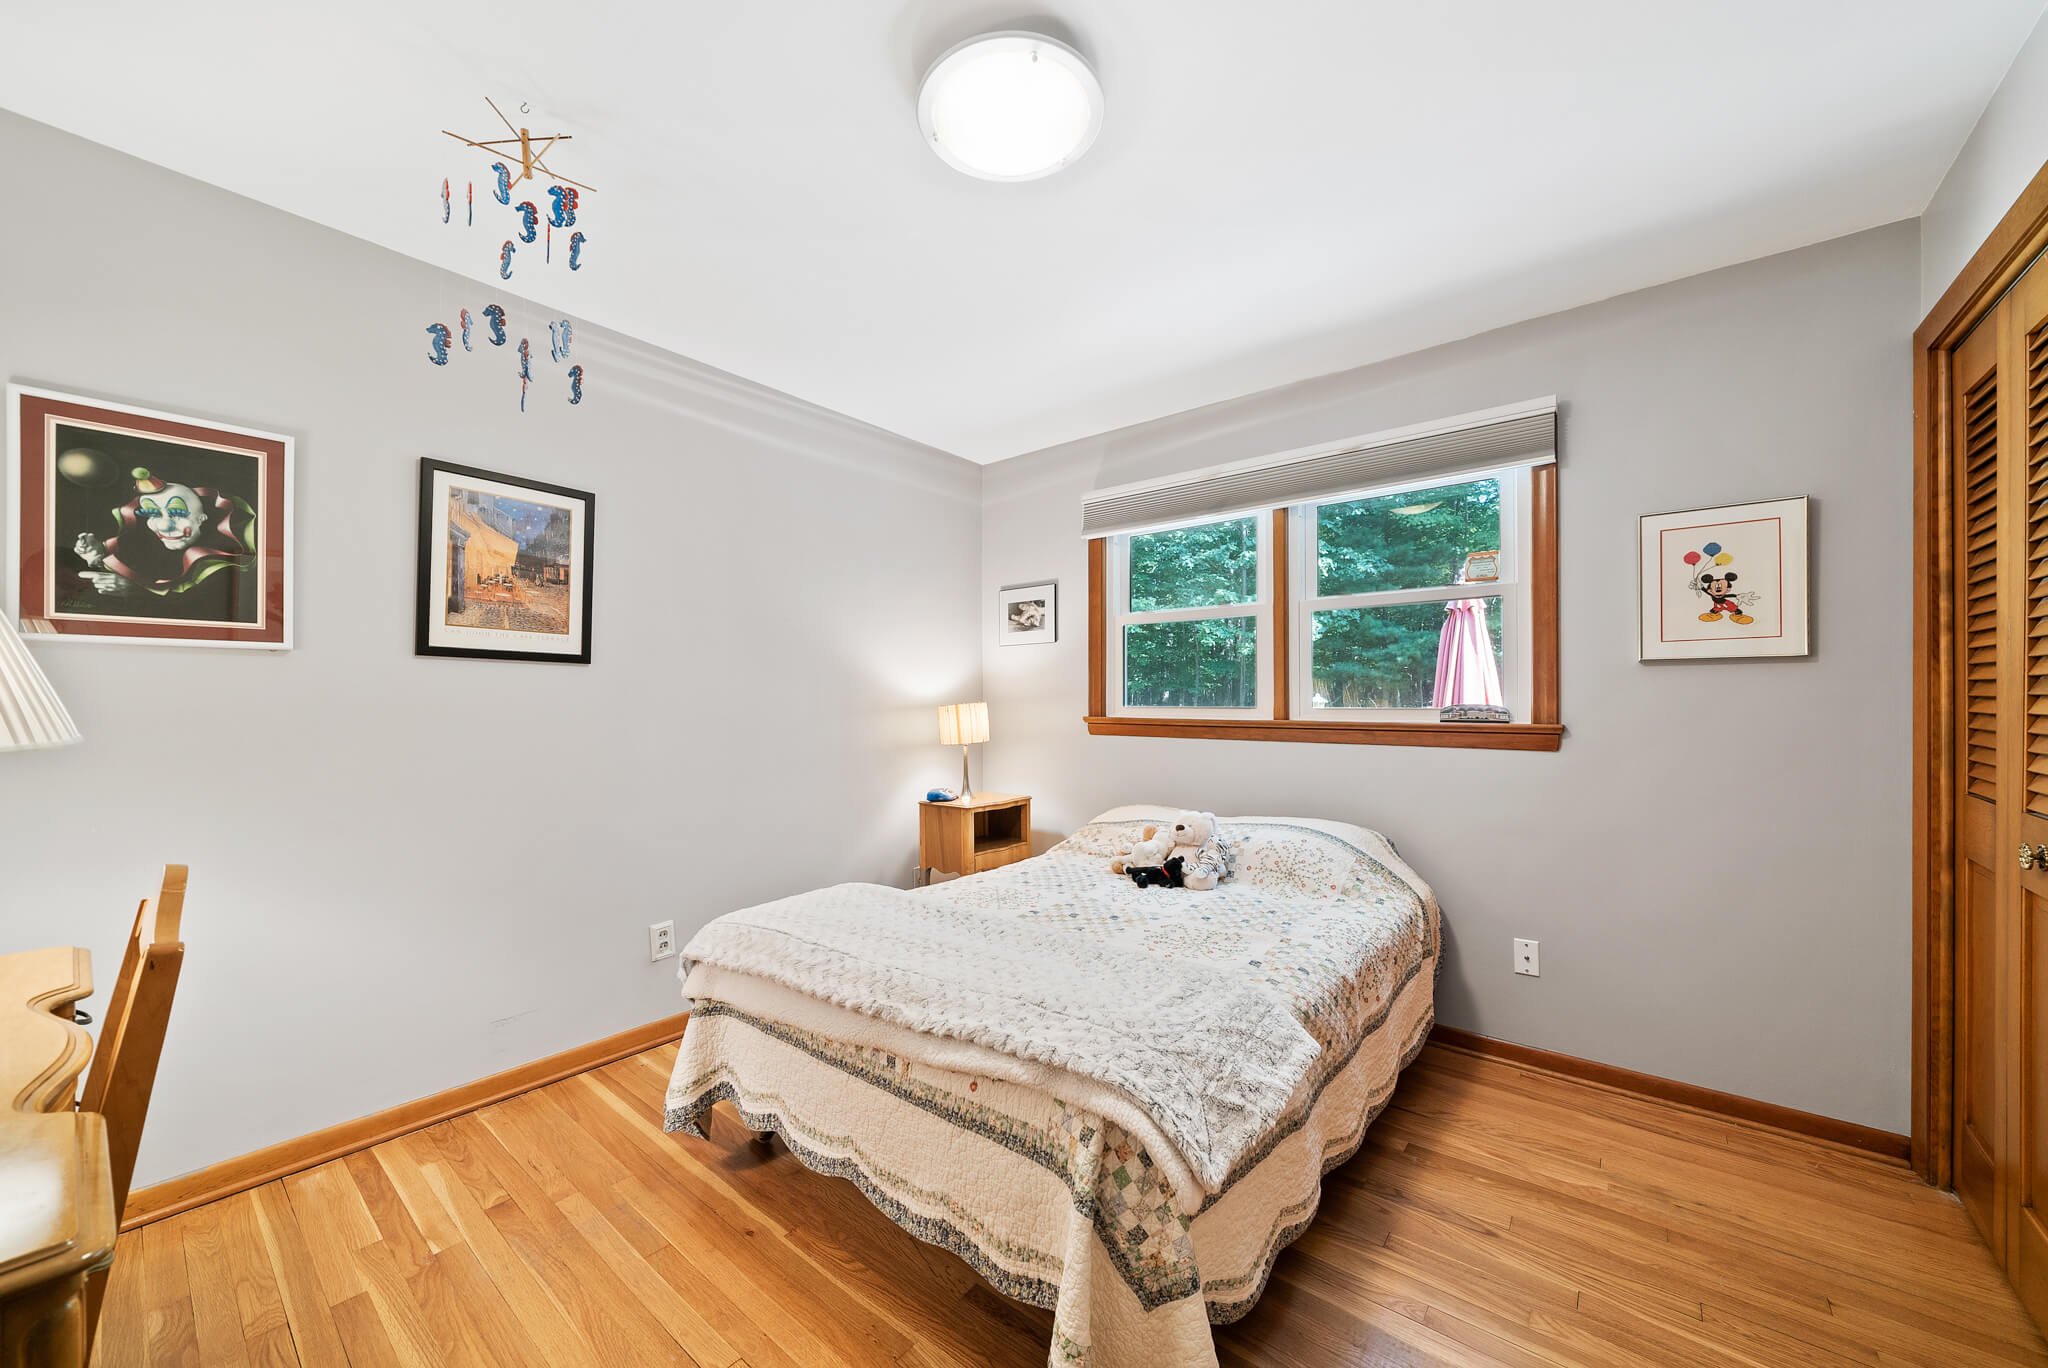 Bedroom number 2 at 4349 Orandale Dr in Chagrin Falls